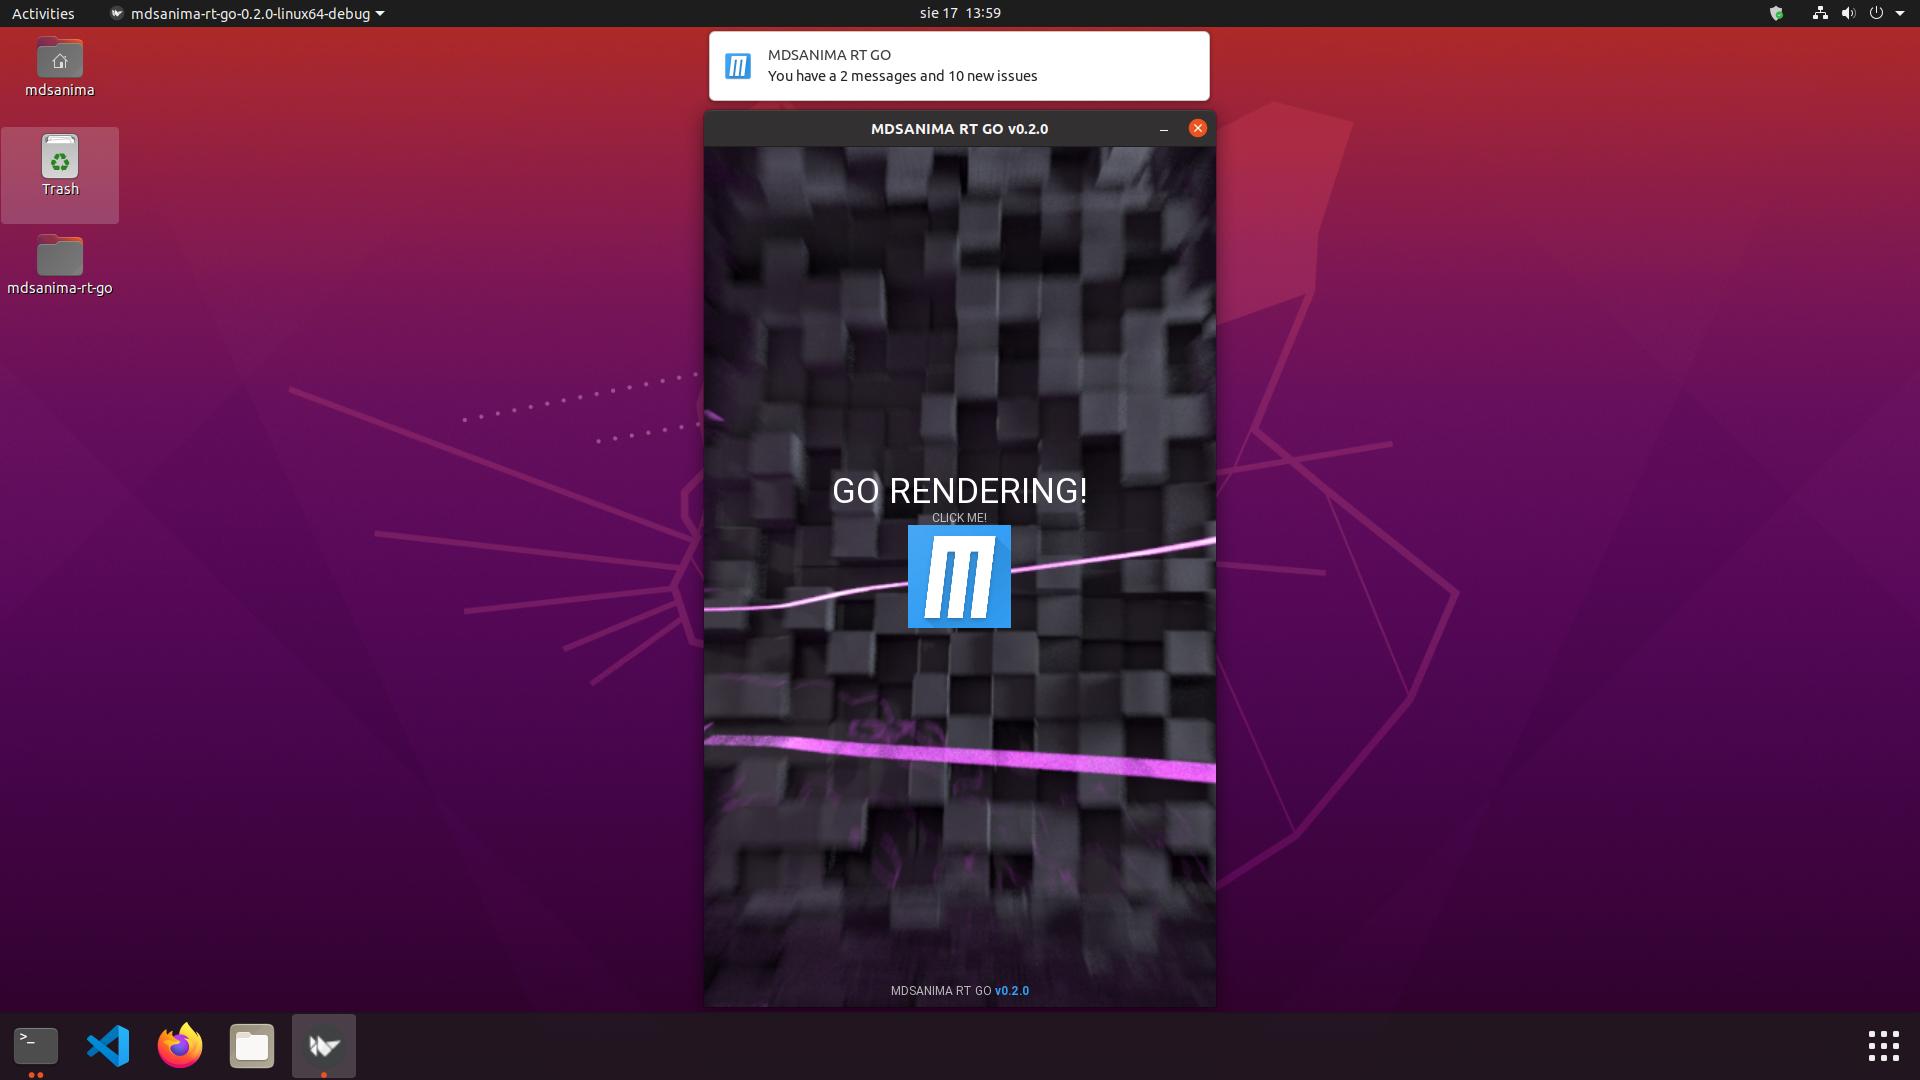 mdsanima rt go-0 2 0-linux64-debug